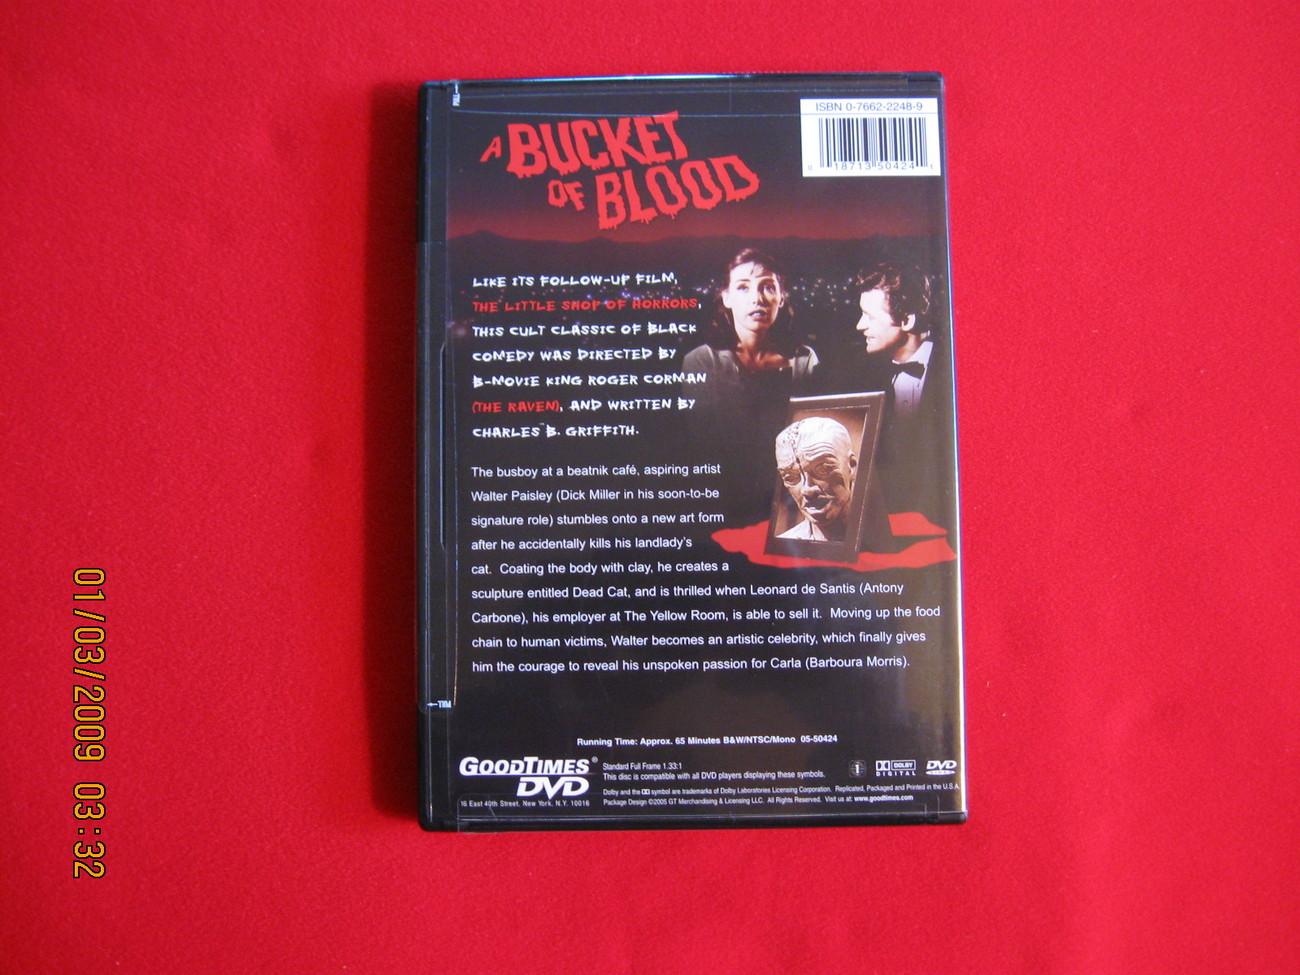 A Bucket of Blood (1959) Starring: Judy Bamber, John Brinkle